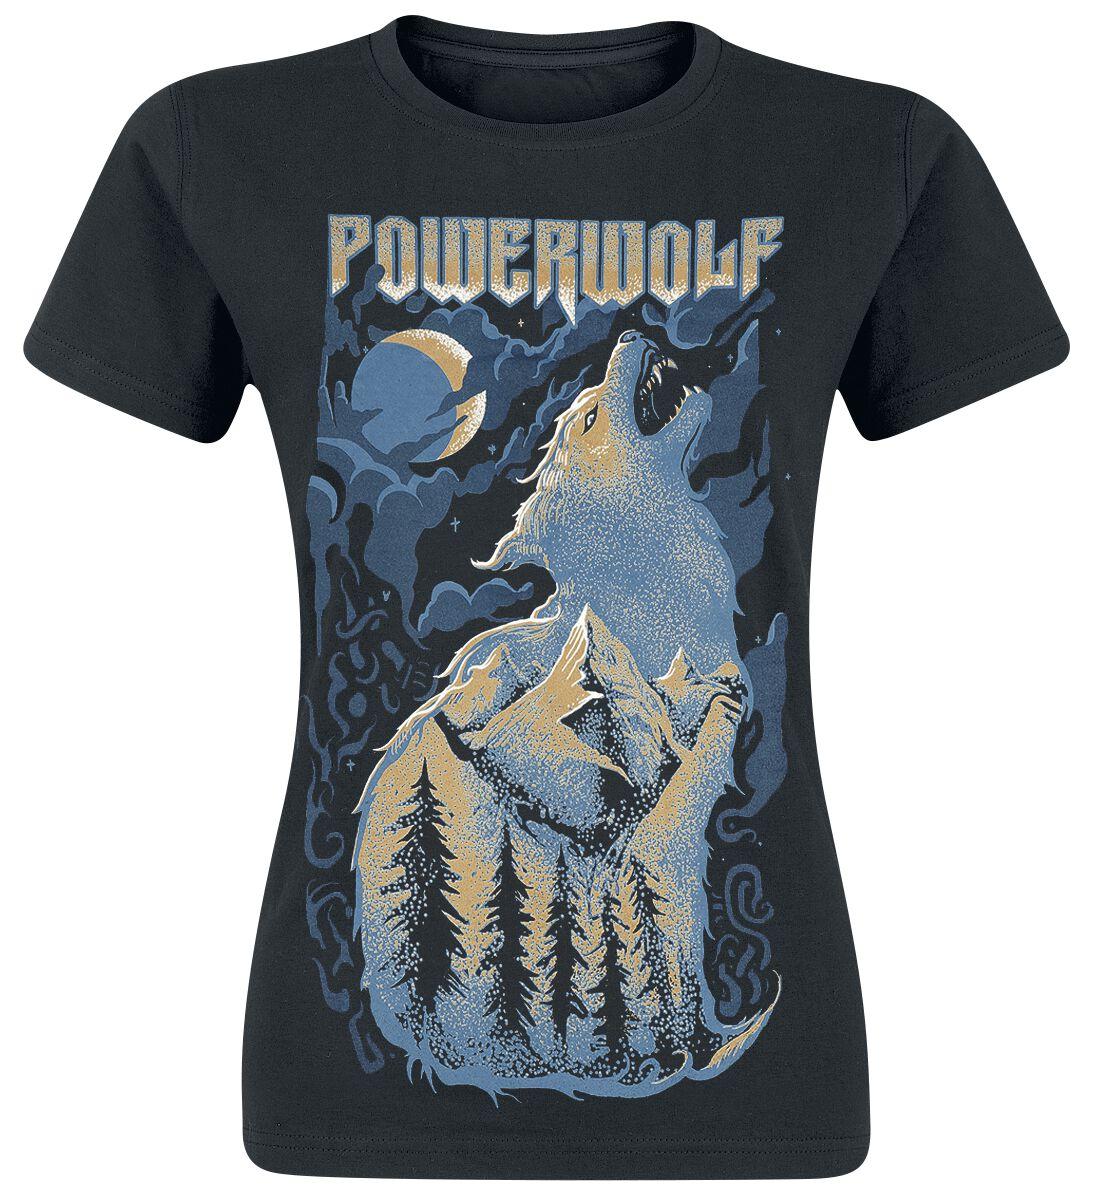 Powerwolf Demons Are A Girl's Best Friend powered by EMP